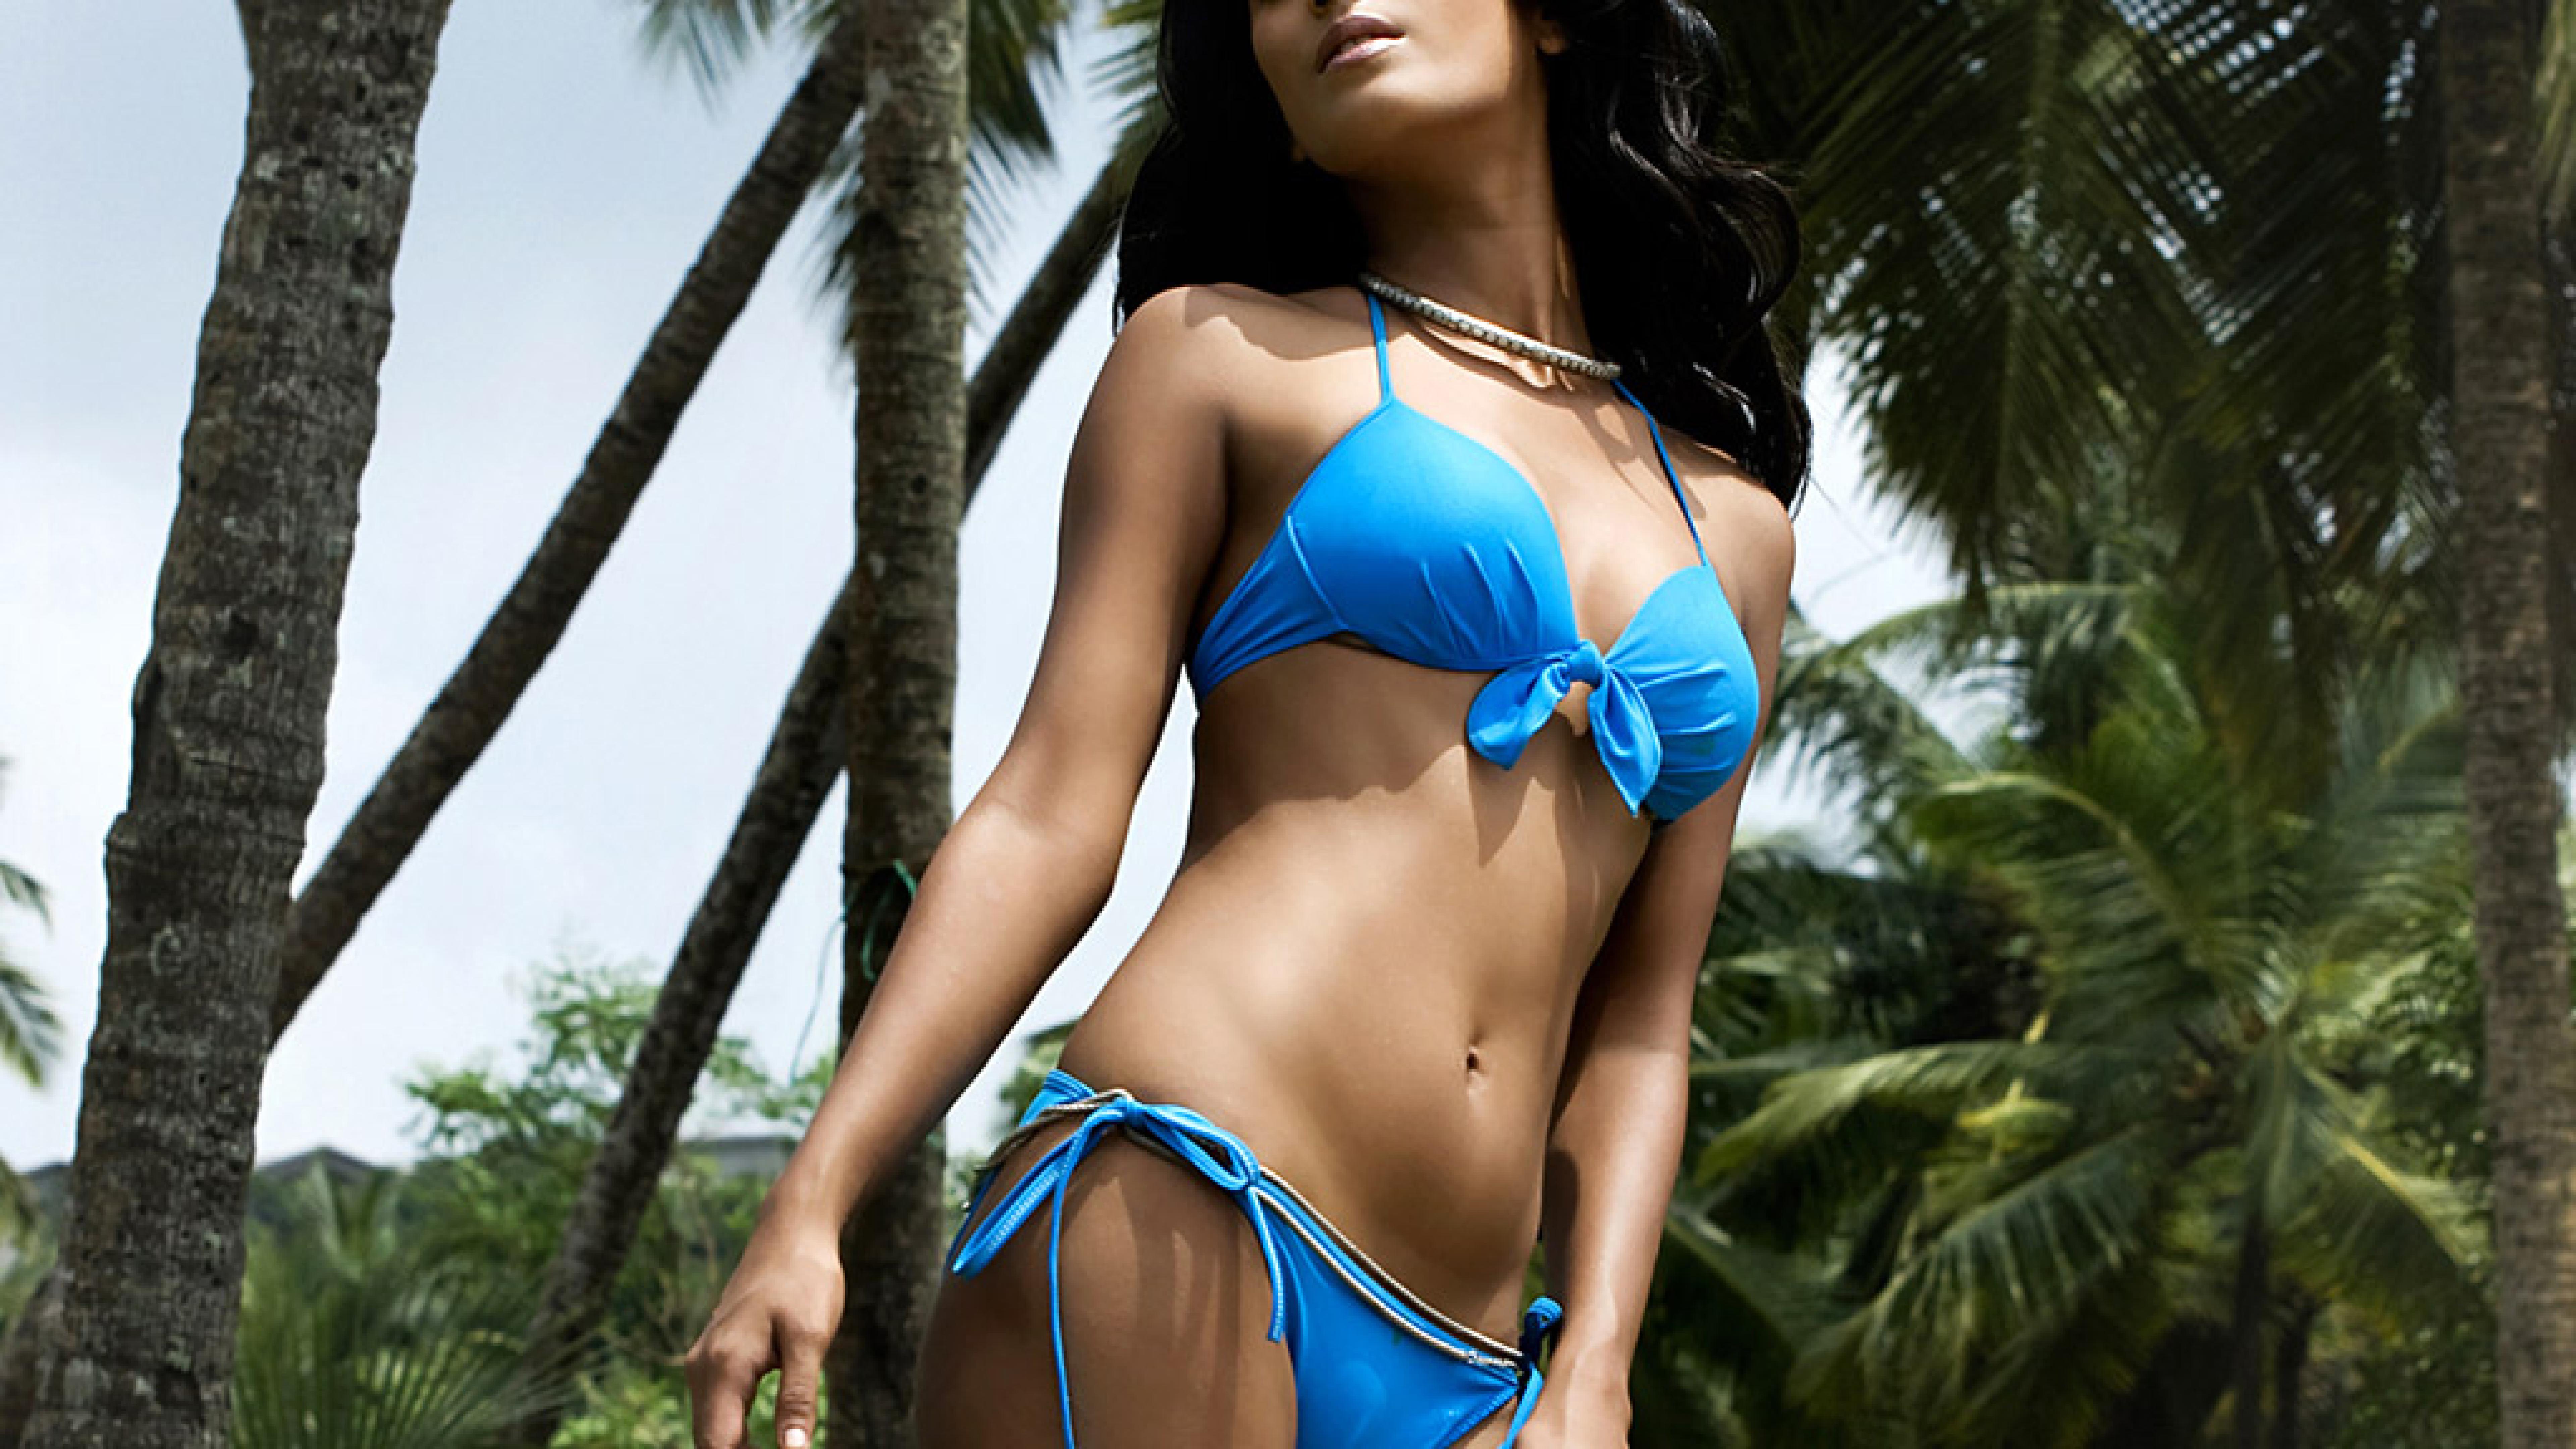 Poonam pandey in bikini photoshoot hd wallpaper - Hd bikini wallpaper download ...